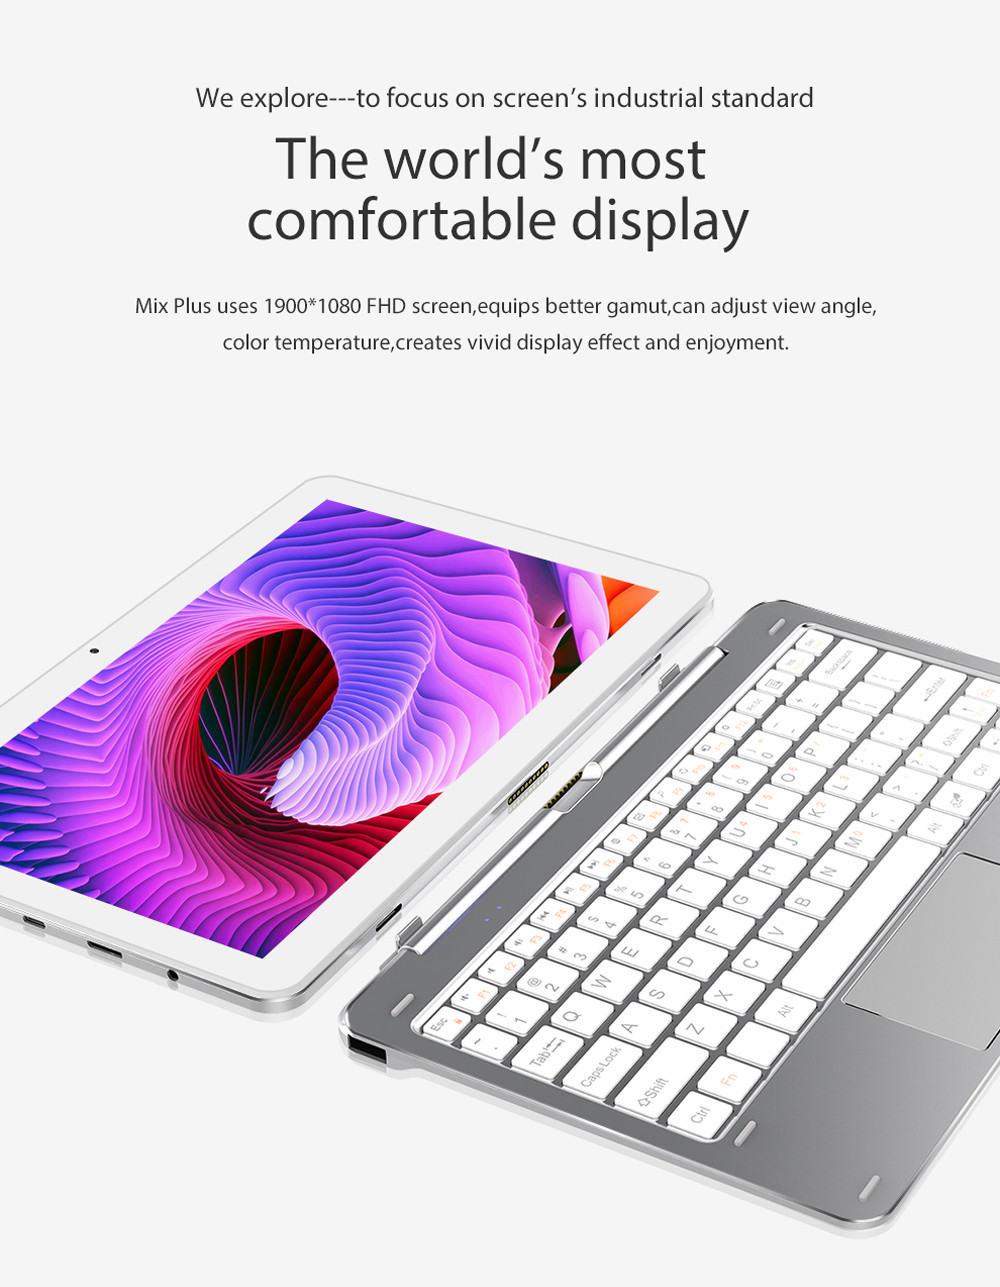 cube-mix-plus-2-in-1-tablet-pc-design